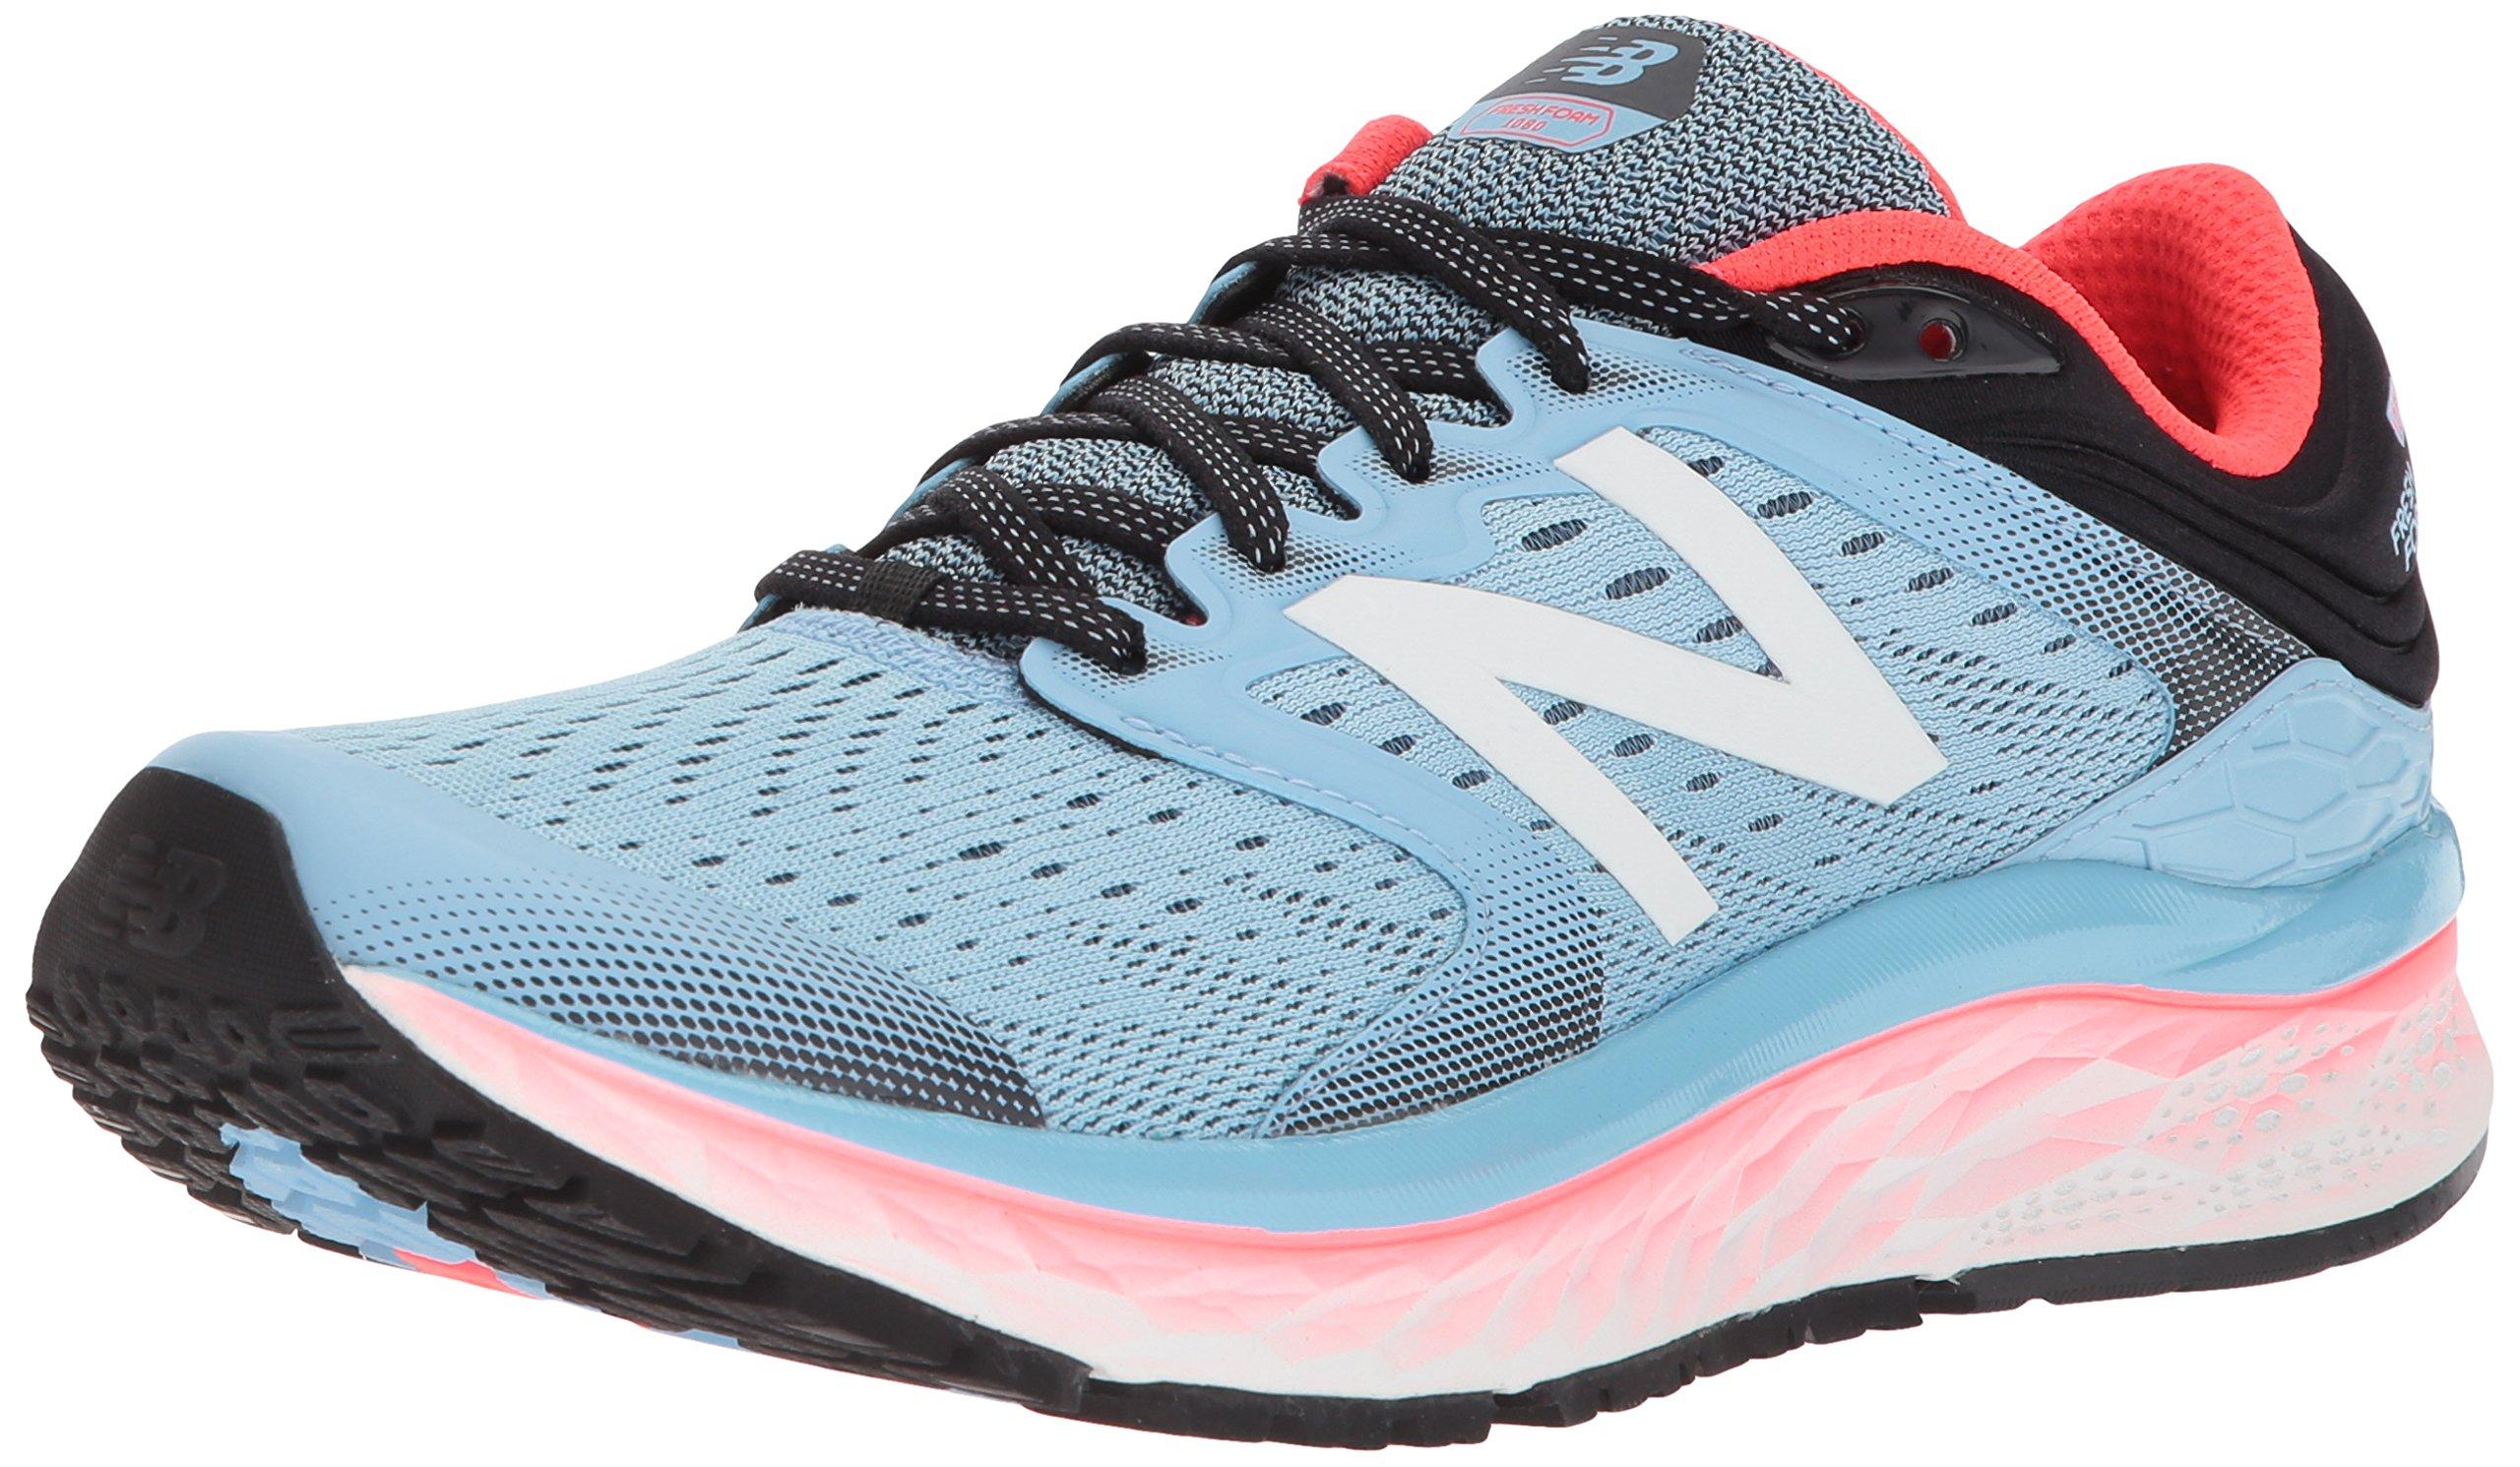 New Balance Women's 1080v8 Fresh Foam Running Shoe, Light Blue, 9.5 D US